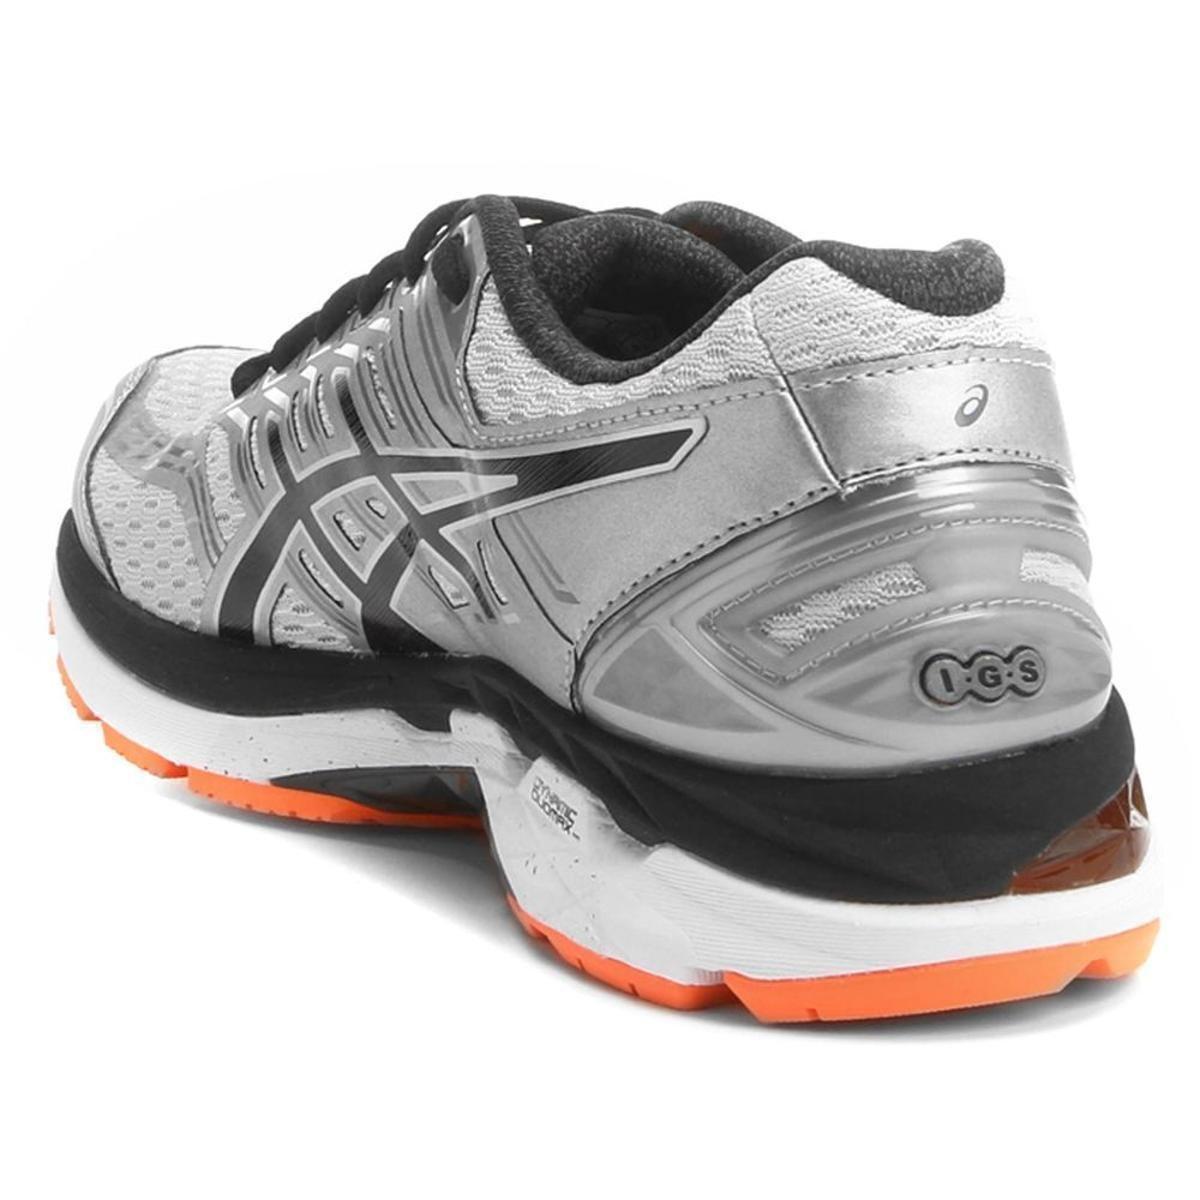 Tênis 2000 Asics 5 Gel GT 2000 5 Tênis Masculino Compre Agora | 7d2c06a - ringtonewebsite.info